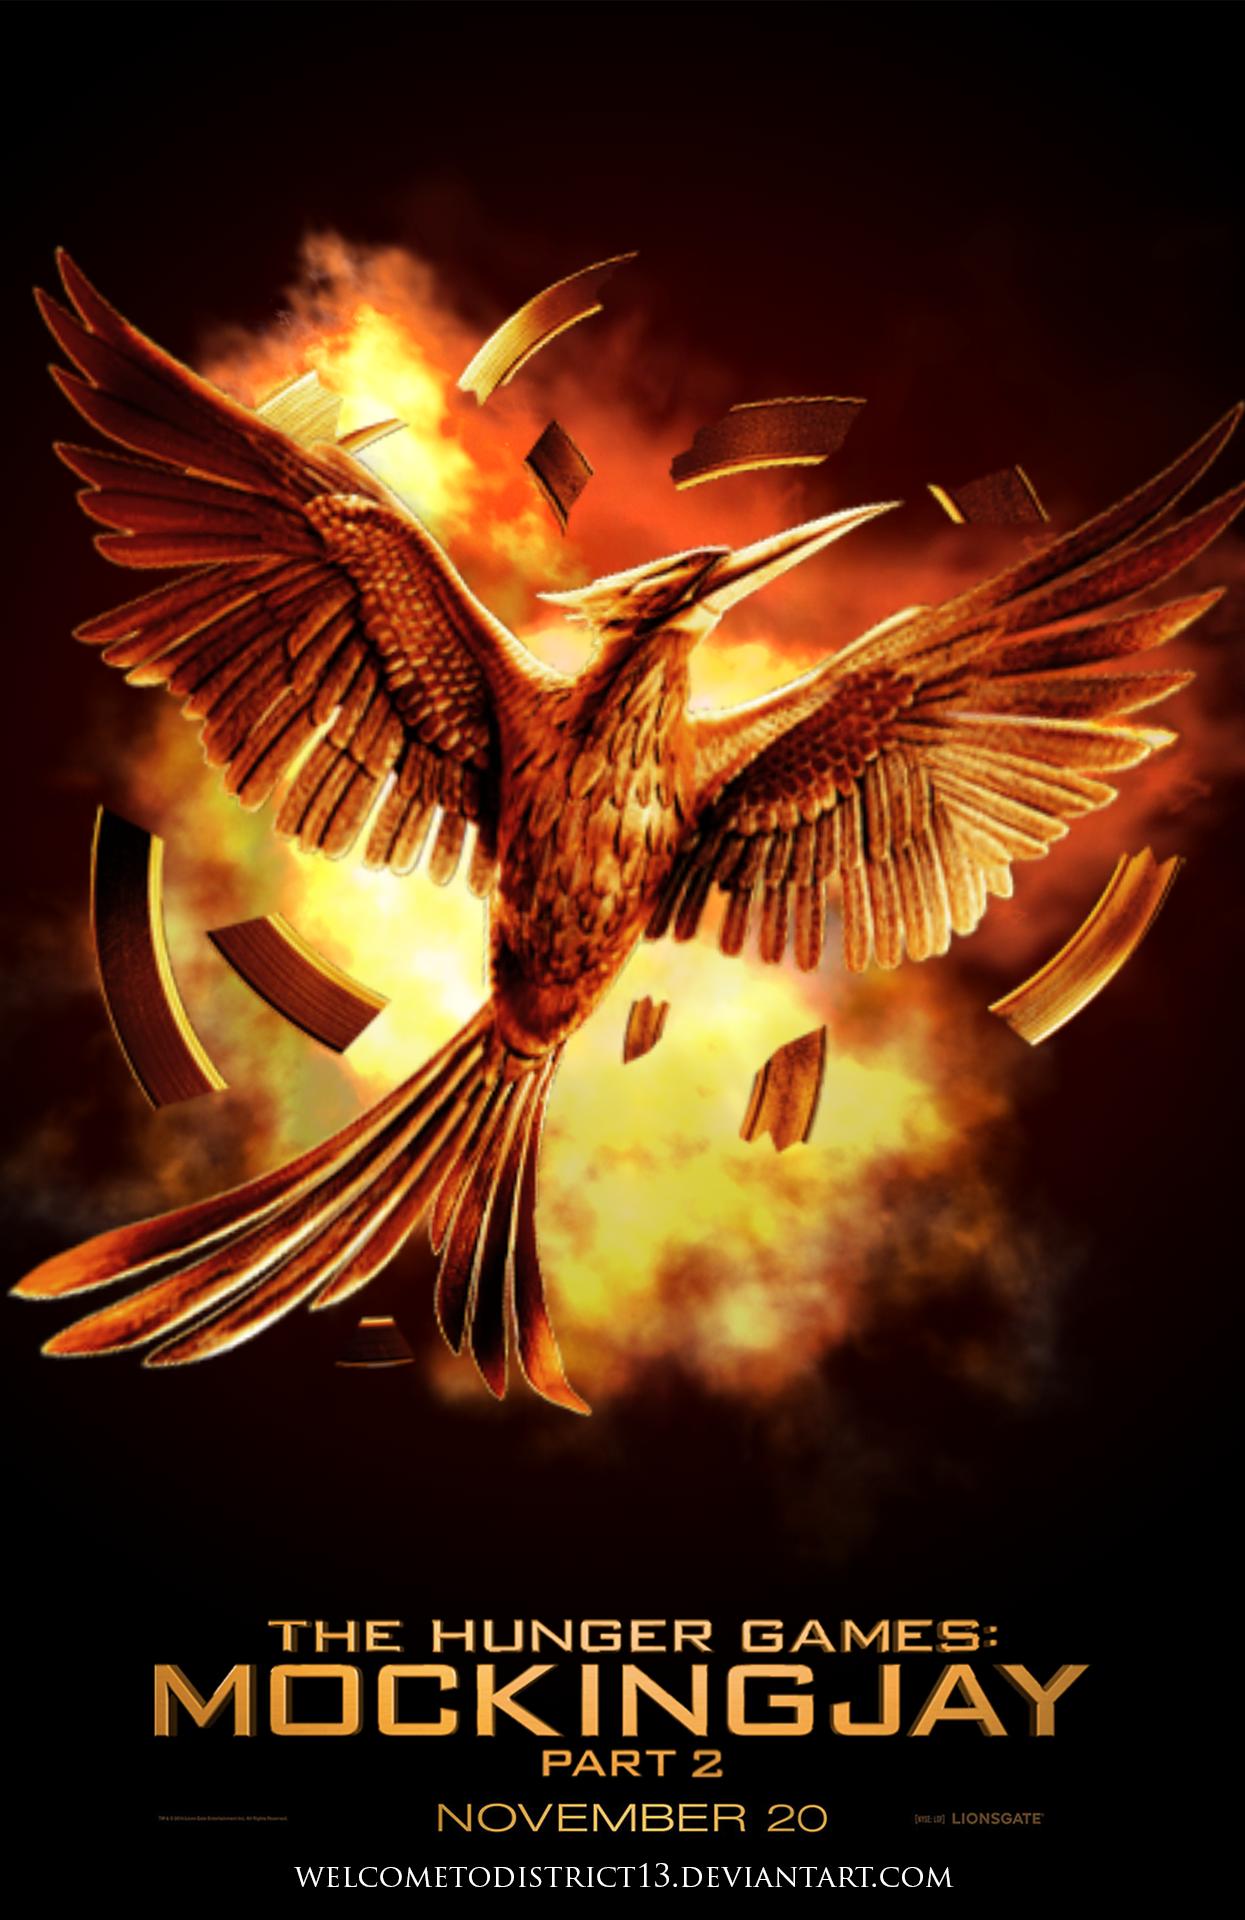 Hunger games mockingjay part 2 free download torrent for mac